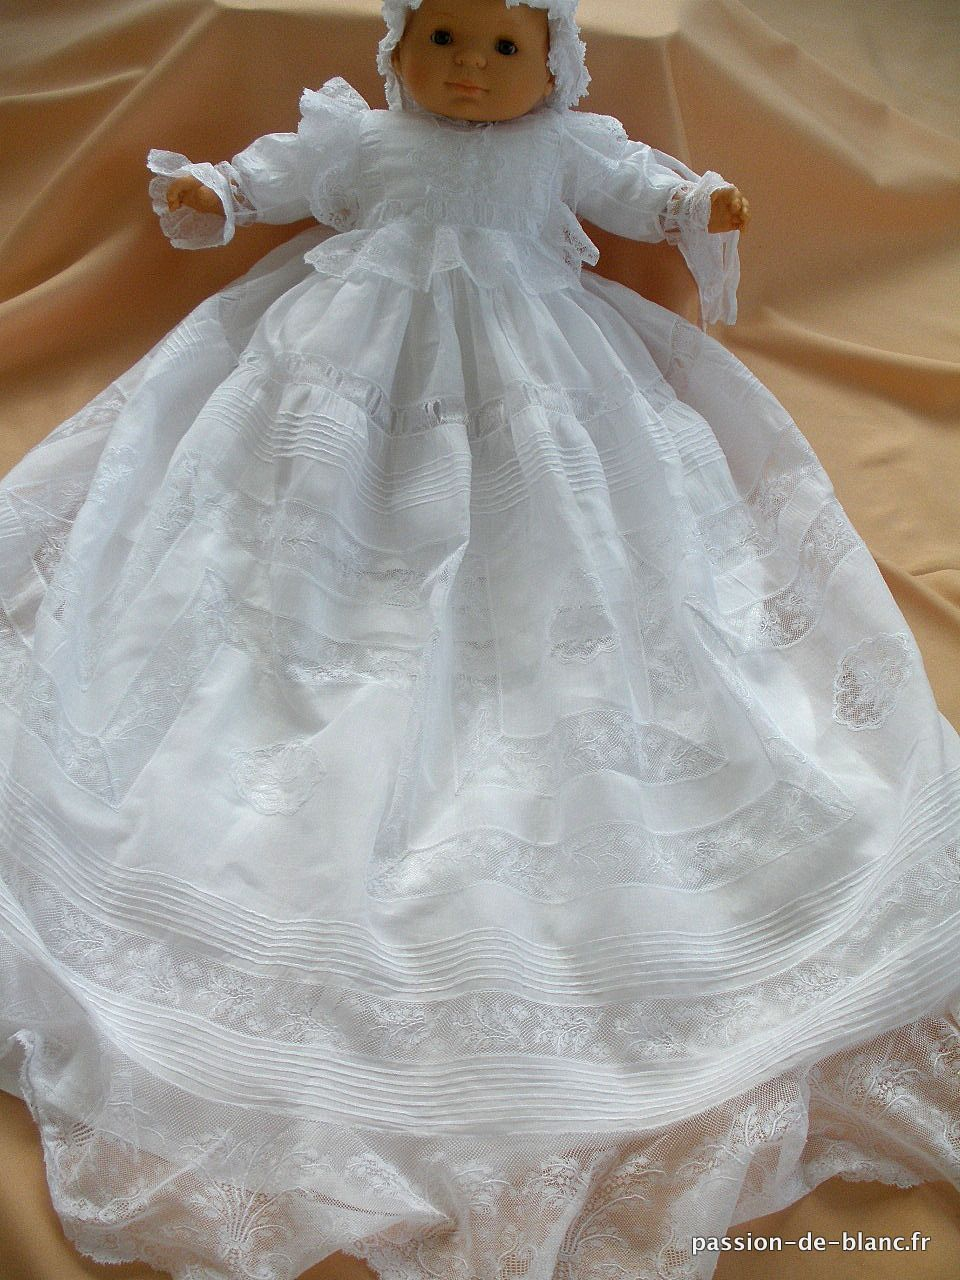 linge anciene merveilleuse robe de bapt me ancienne avec dentelle et fond de robe en satin. Black Bedroom Furniture Sets. Home Design Ideas